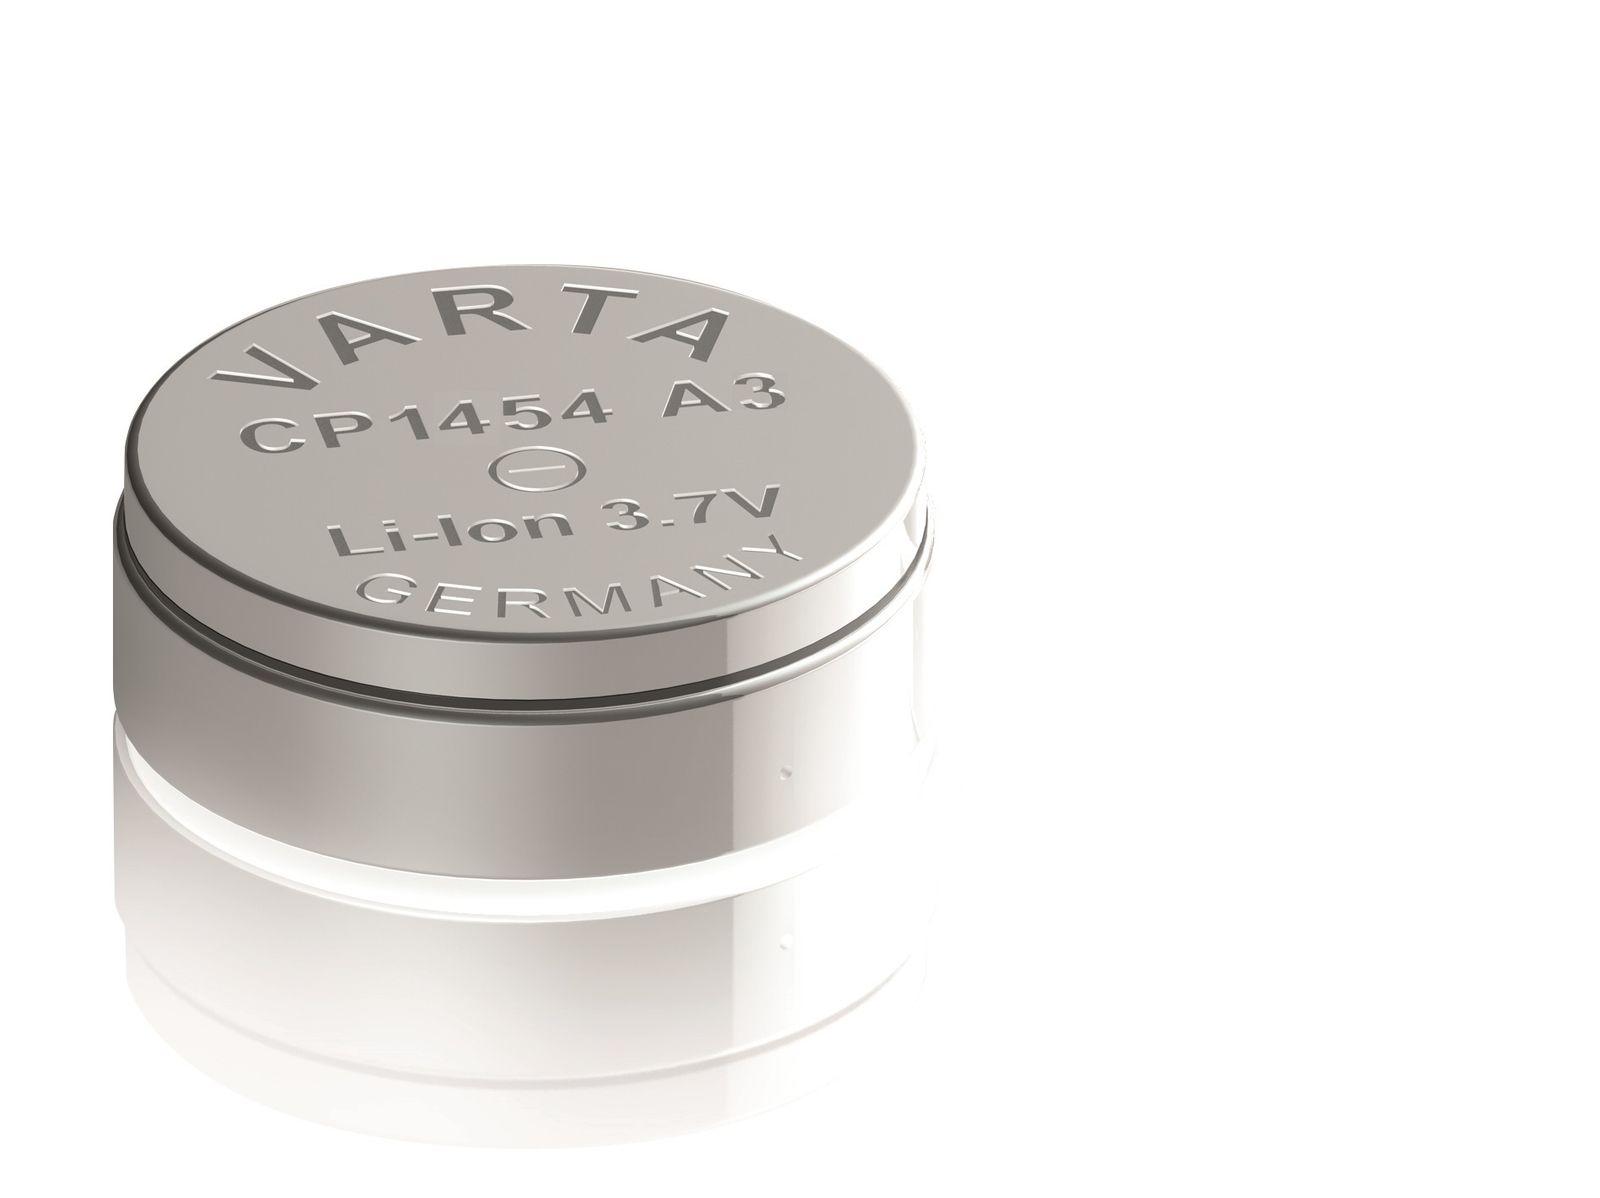 Lithium-Ionen Knopfzelle / Varta